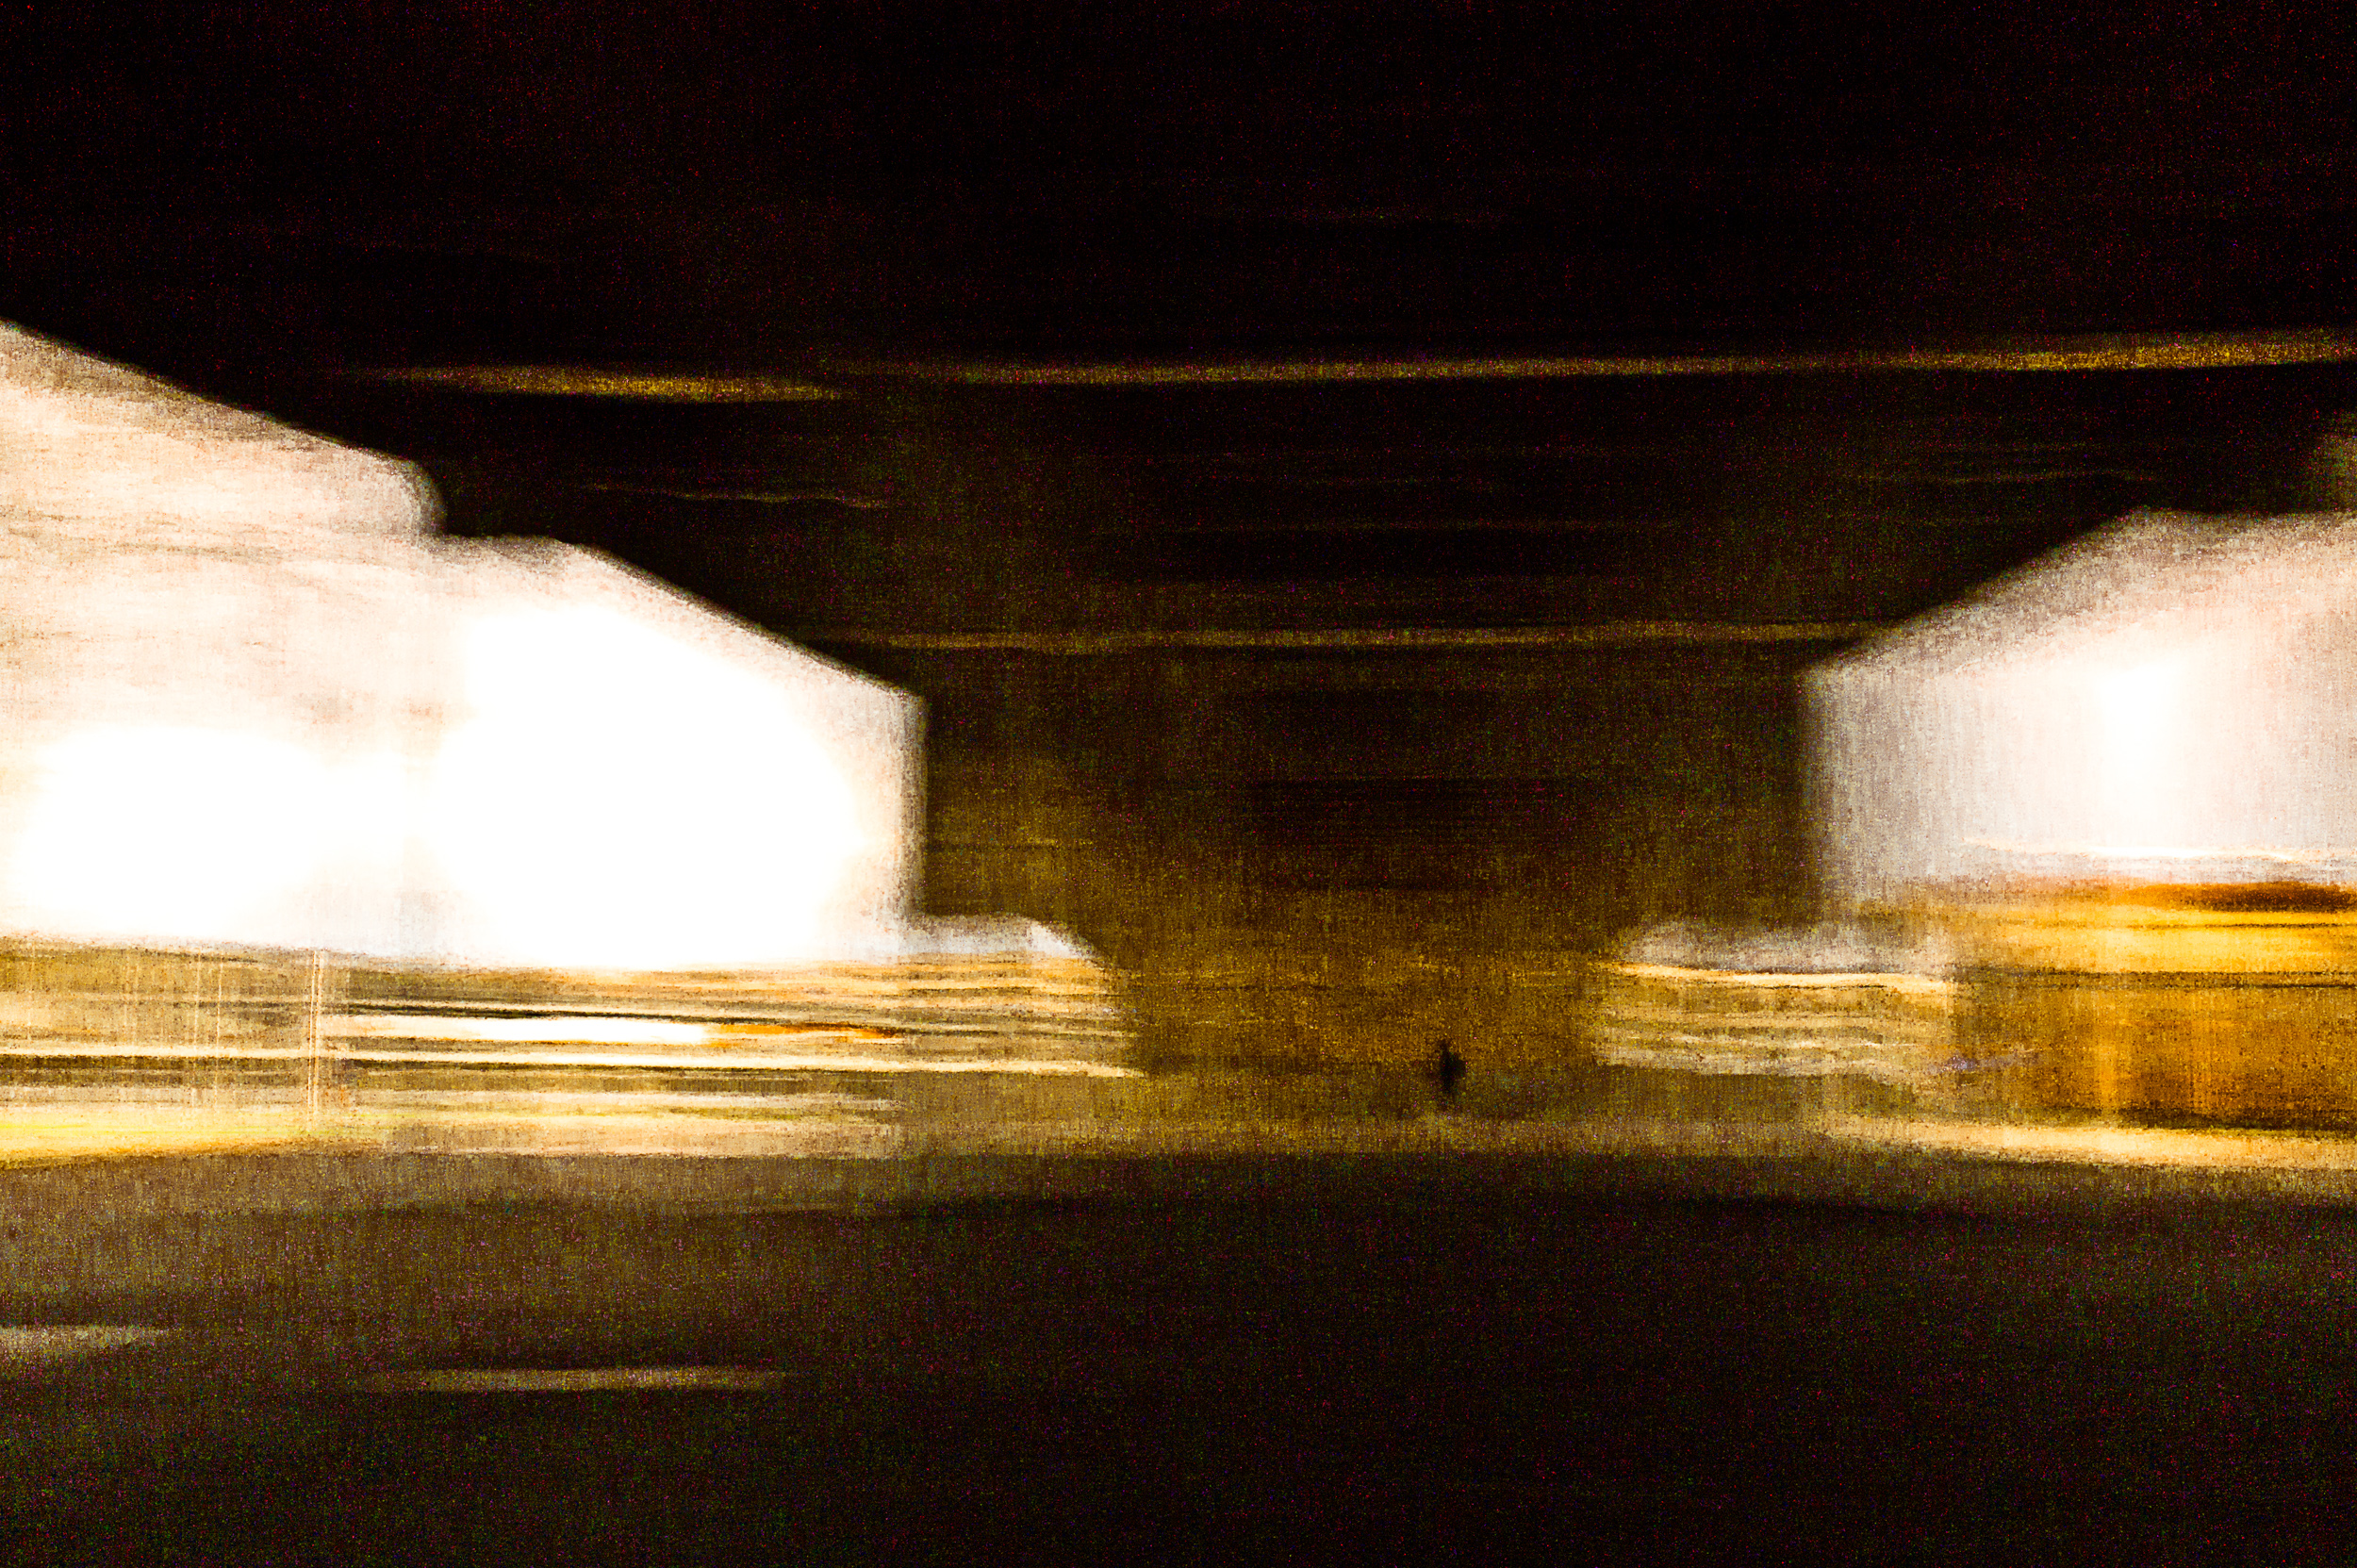 Cityscape no 7670 - fol-de-rol